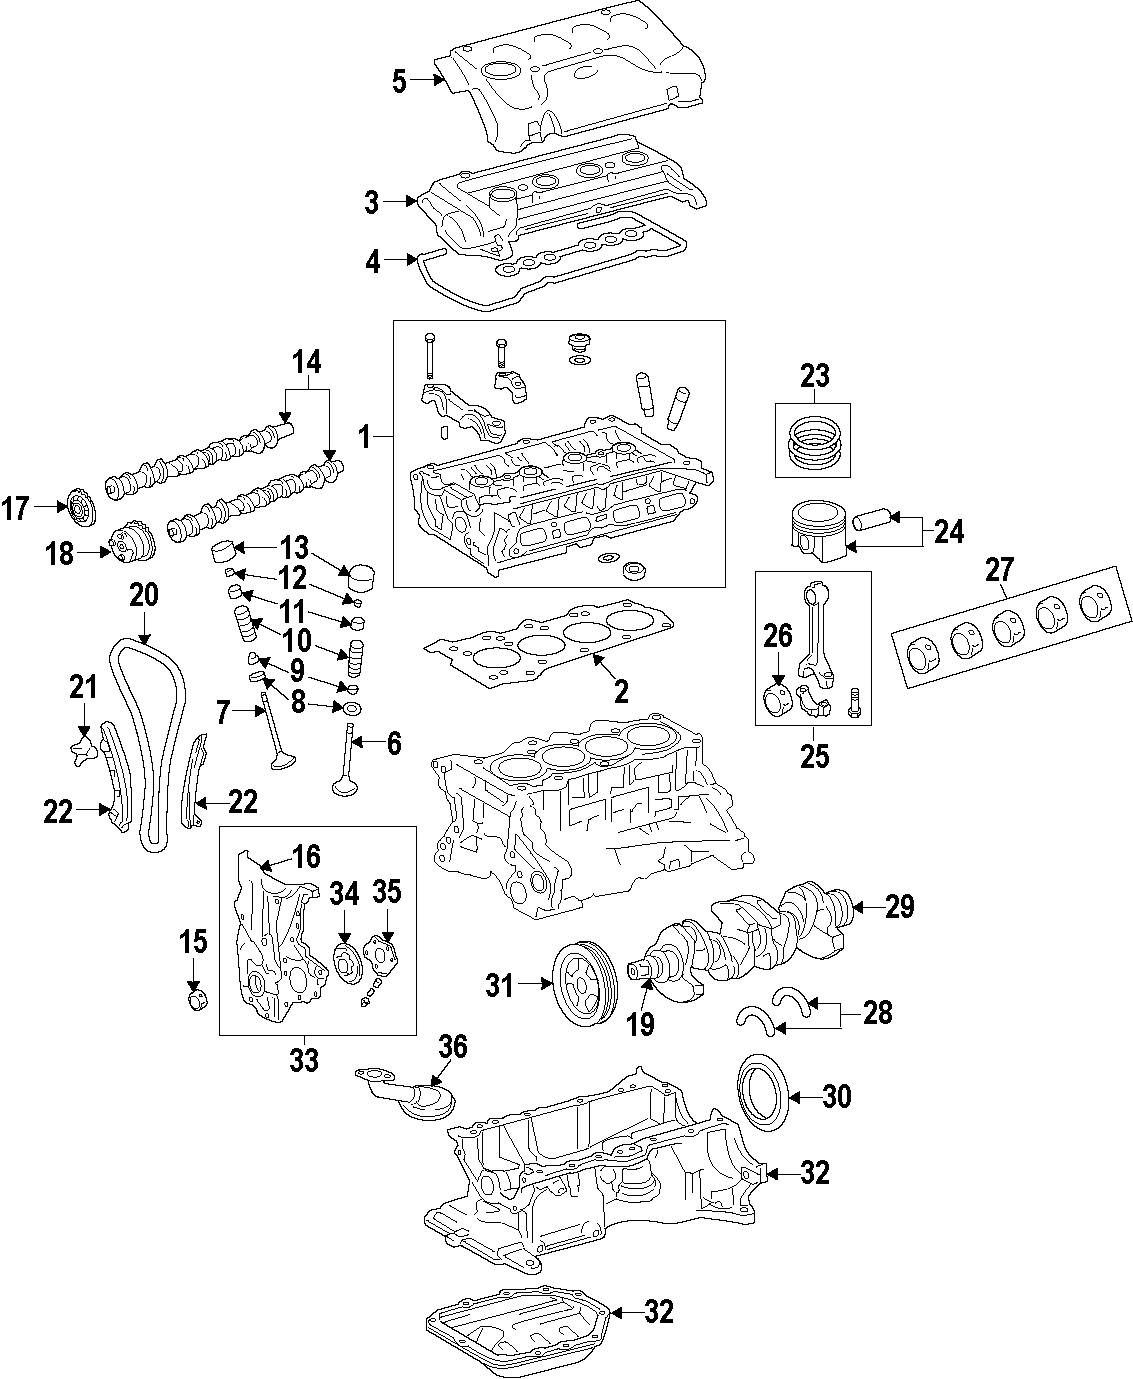 toyota tailgate parts diagram